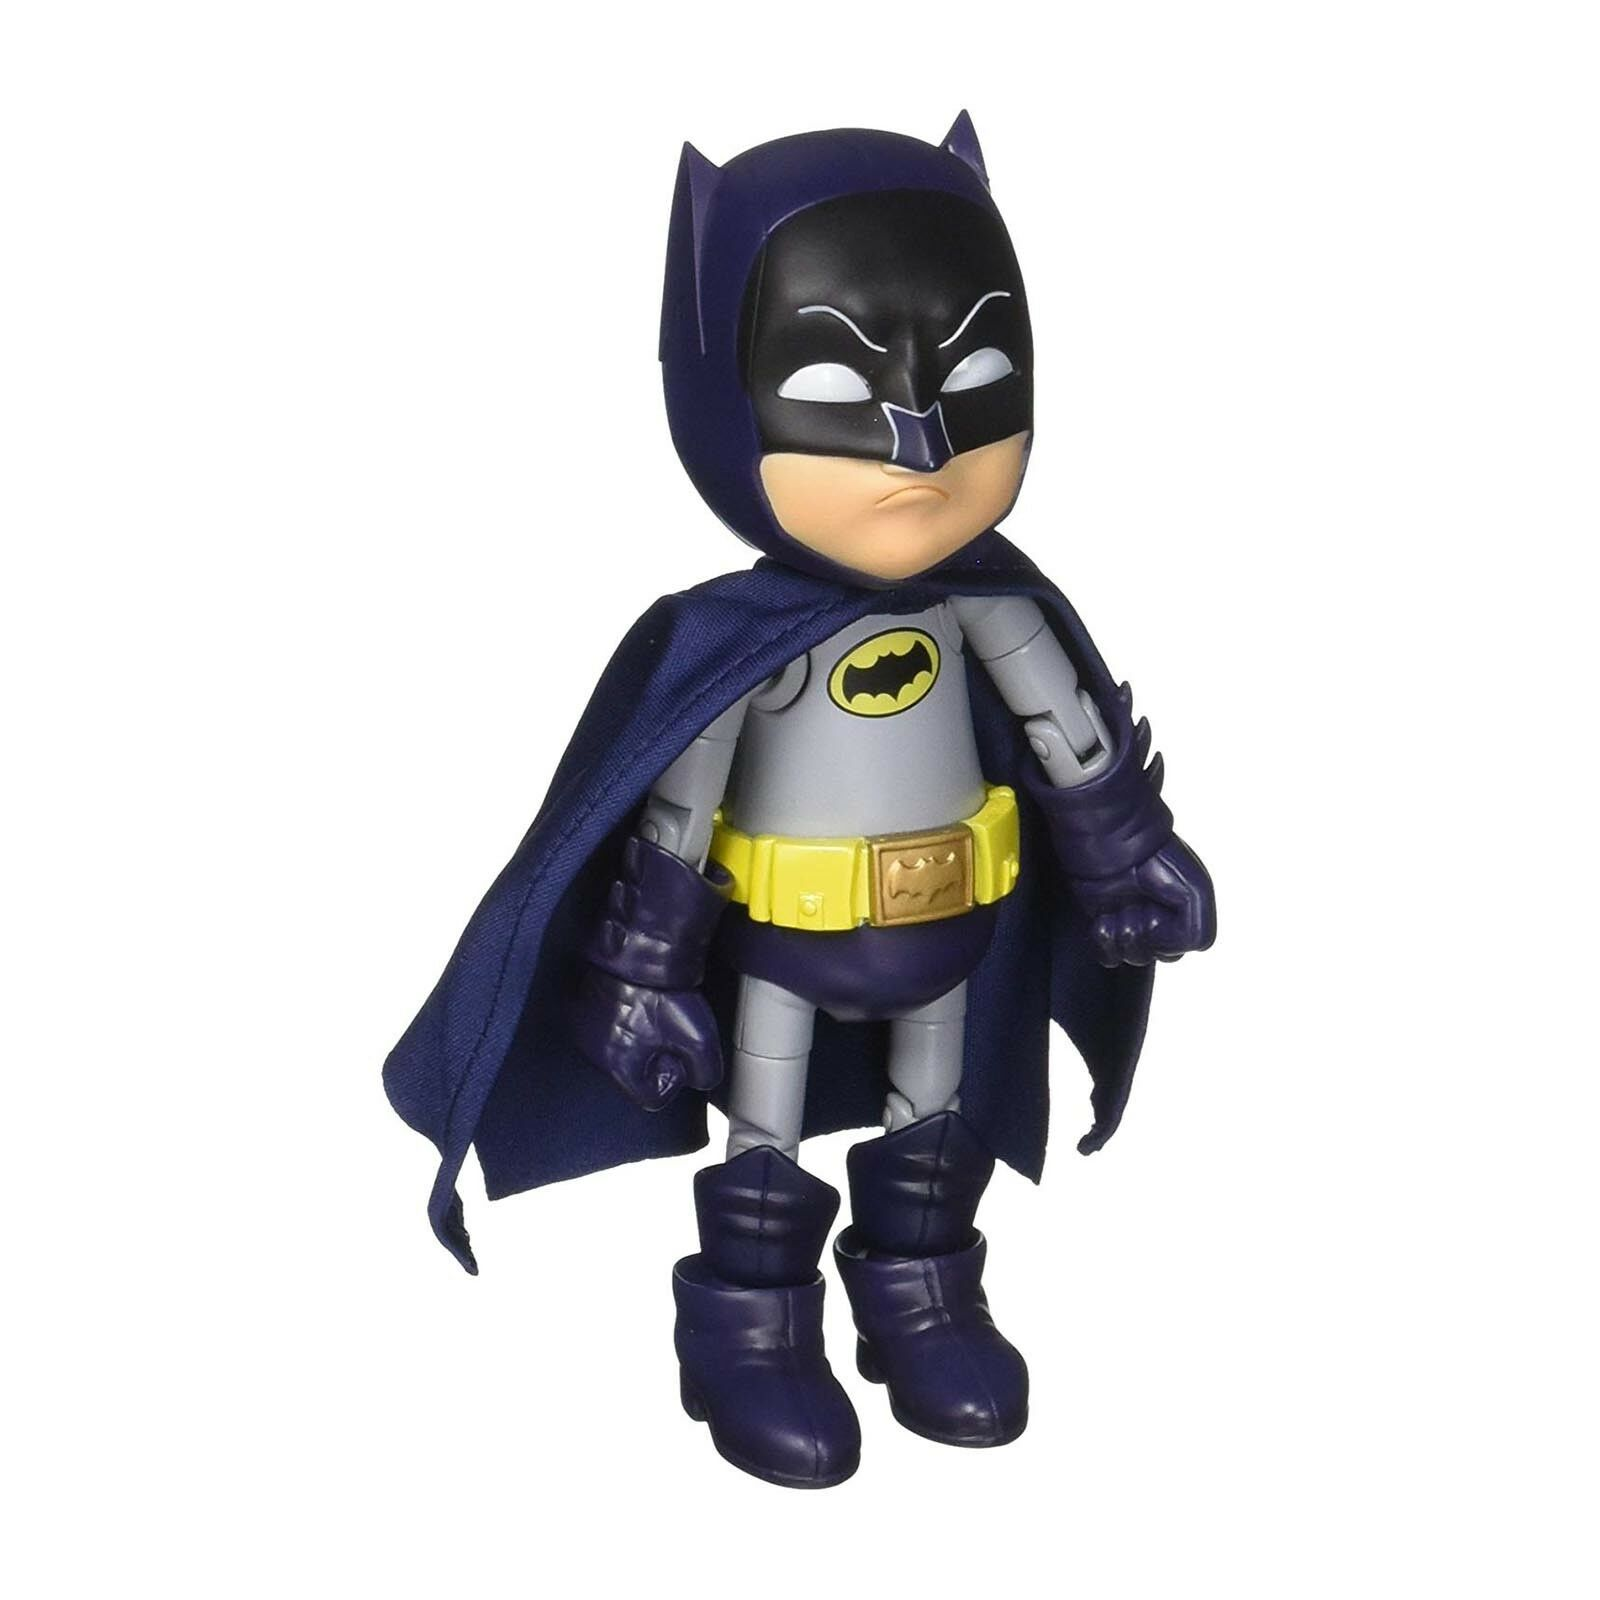 Herocross Batman 1966 TV Batman Hybrid Metal Figure NEW Collectible